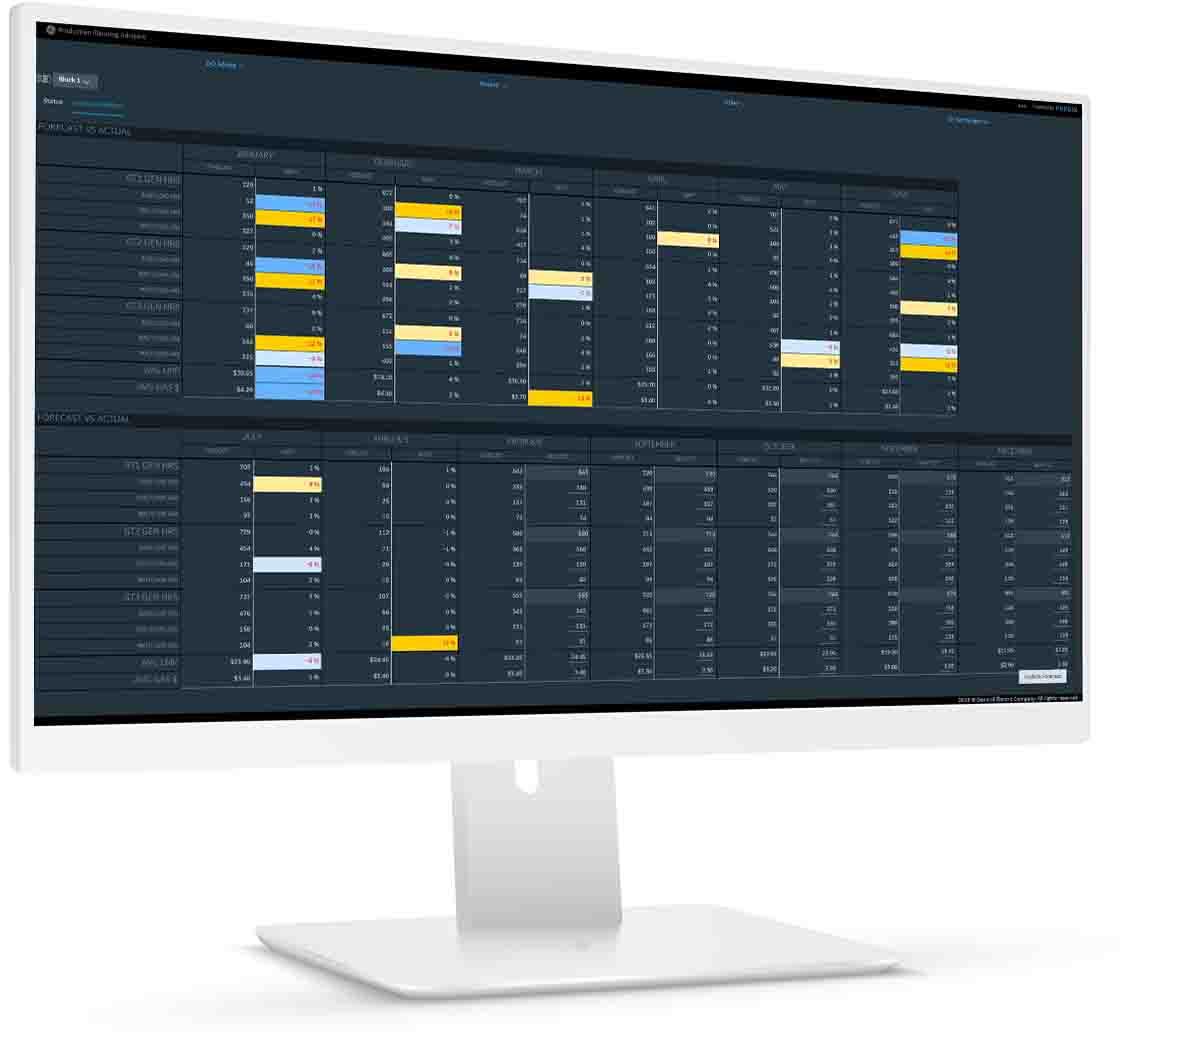 OPM for Power Generators   software screenshot   GE Digital